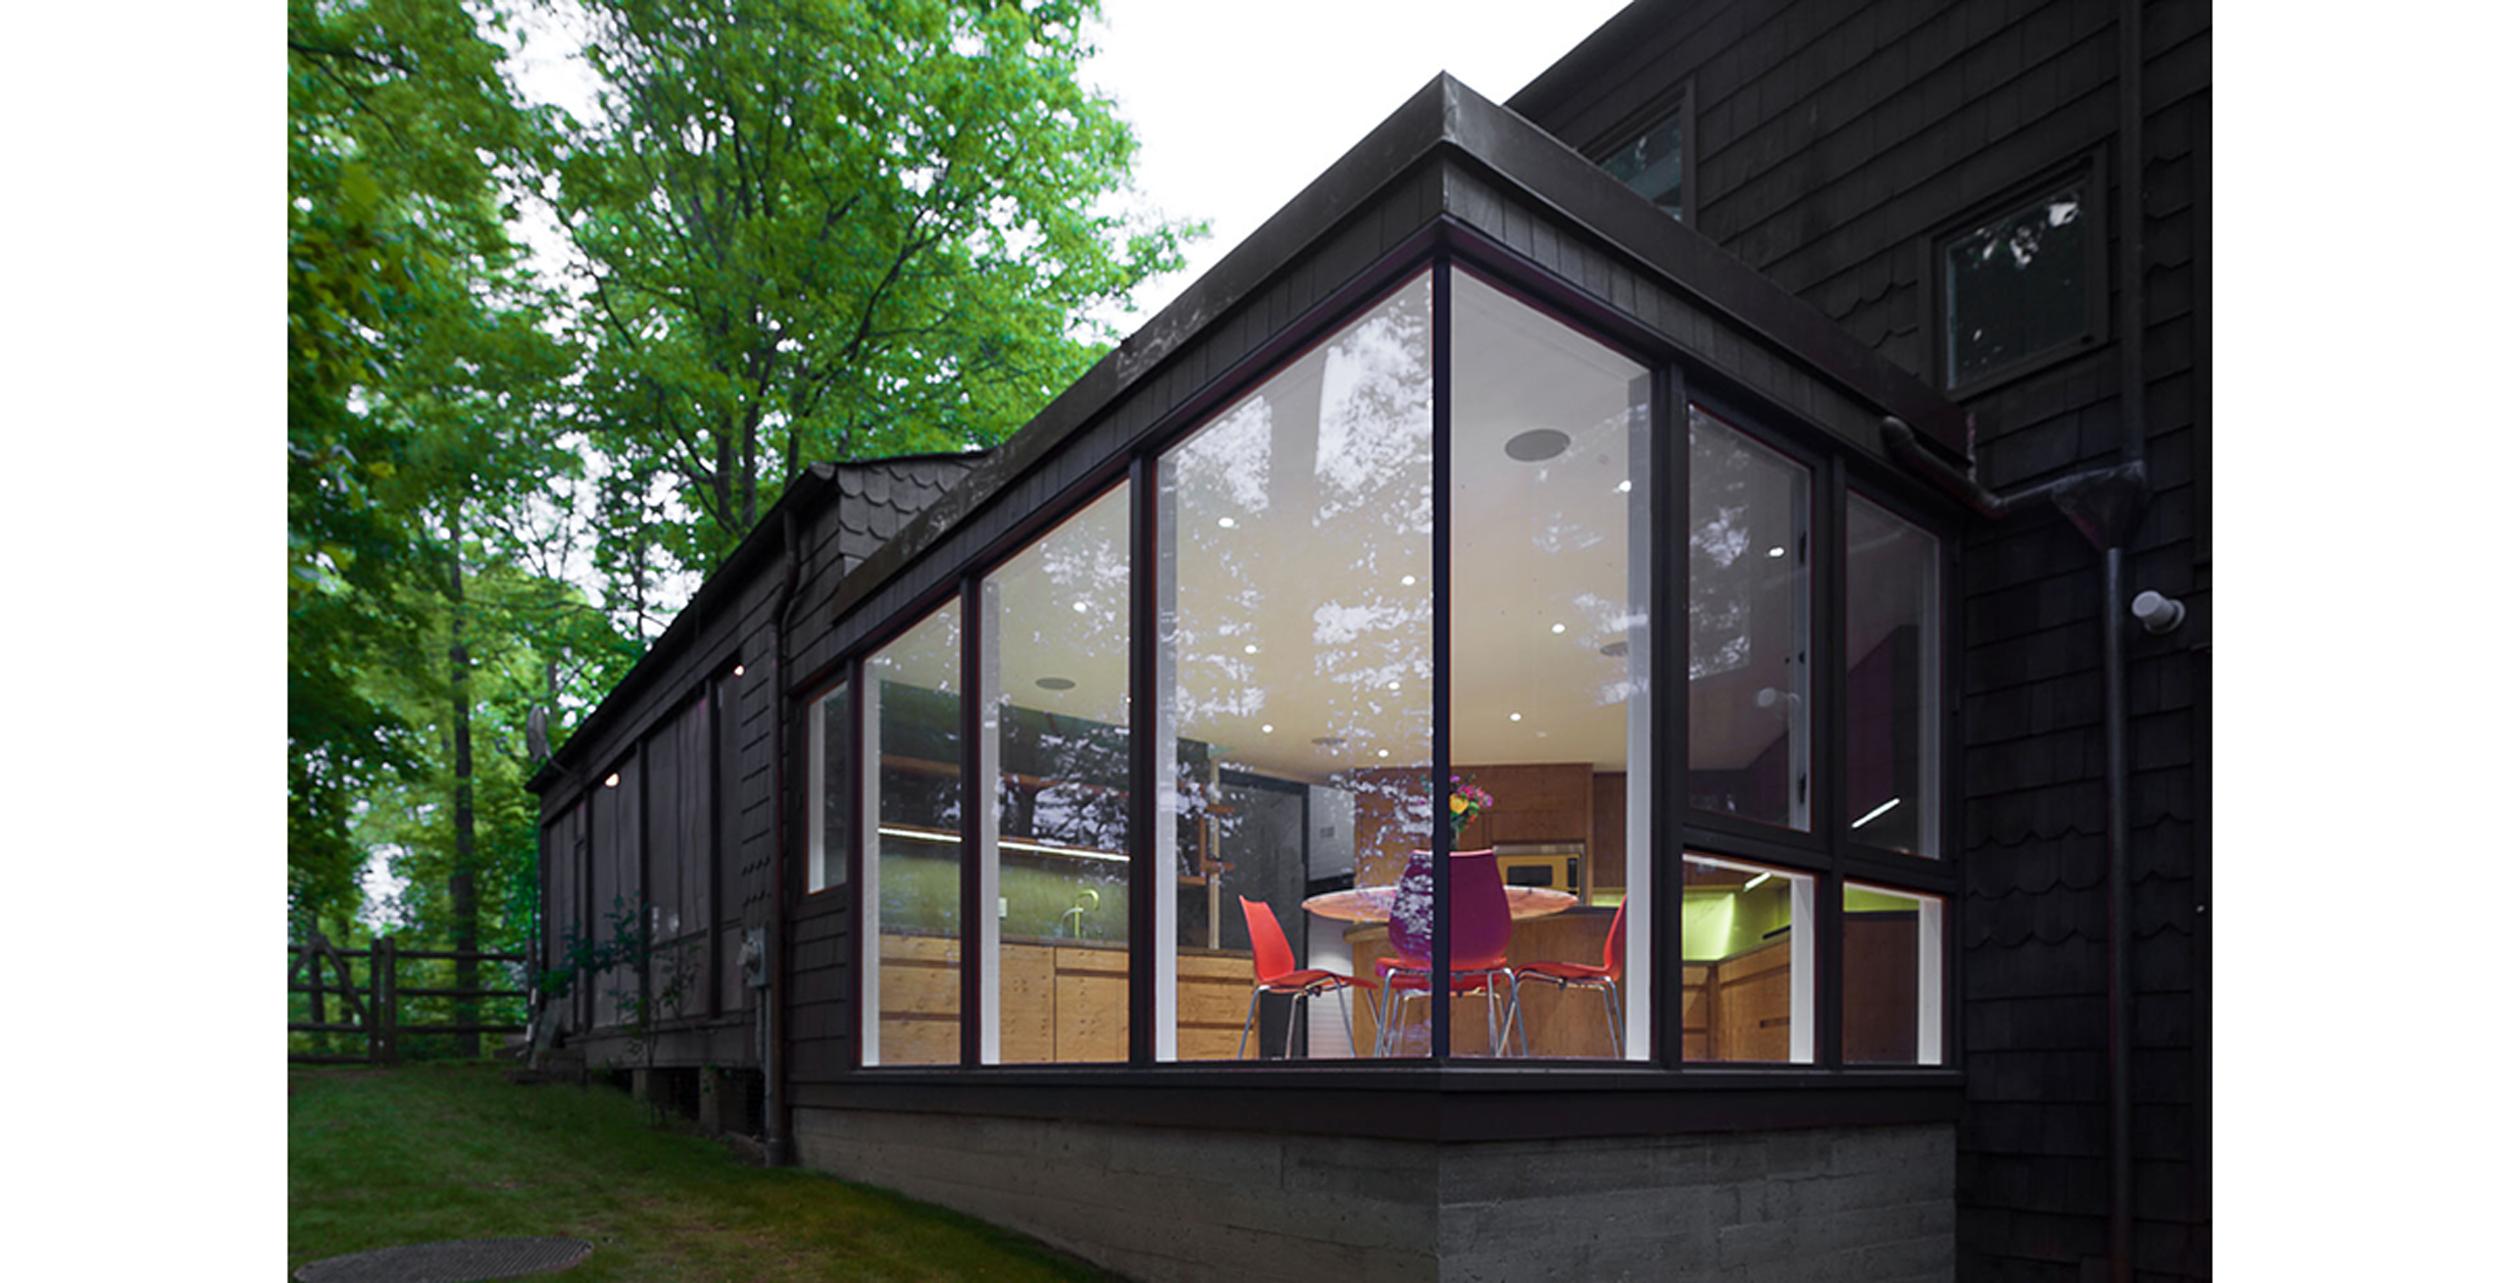 Dobbs-Ferry-David-Bucovy-Architect.png